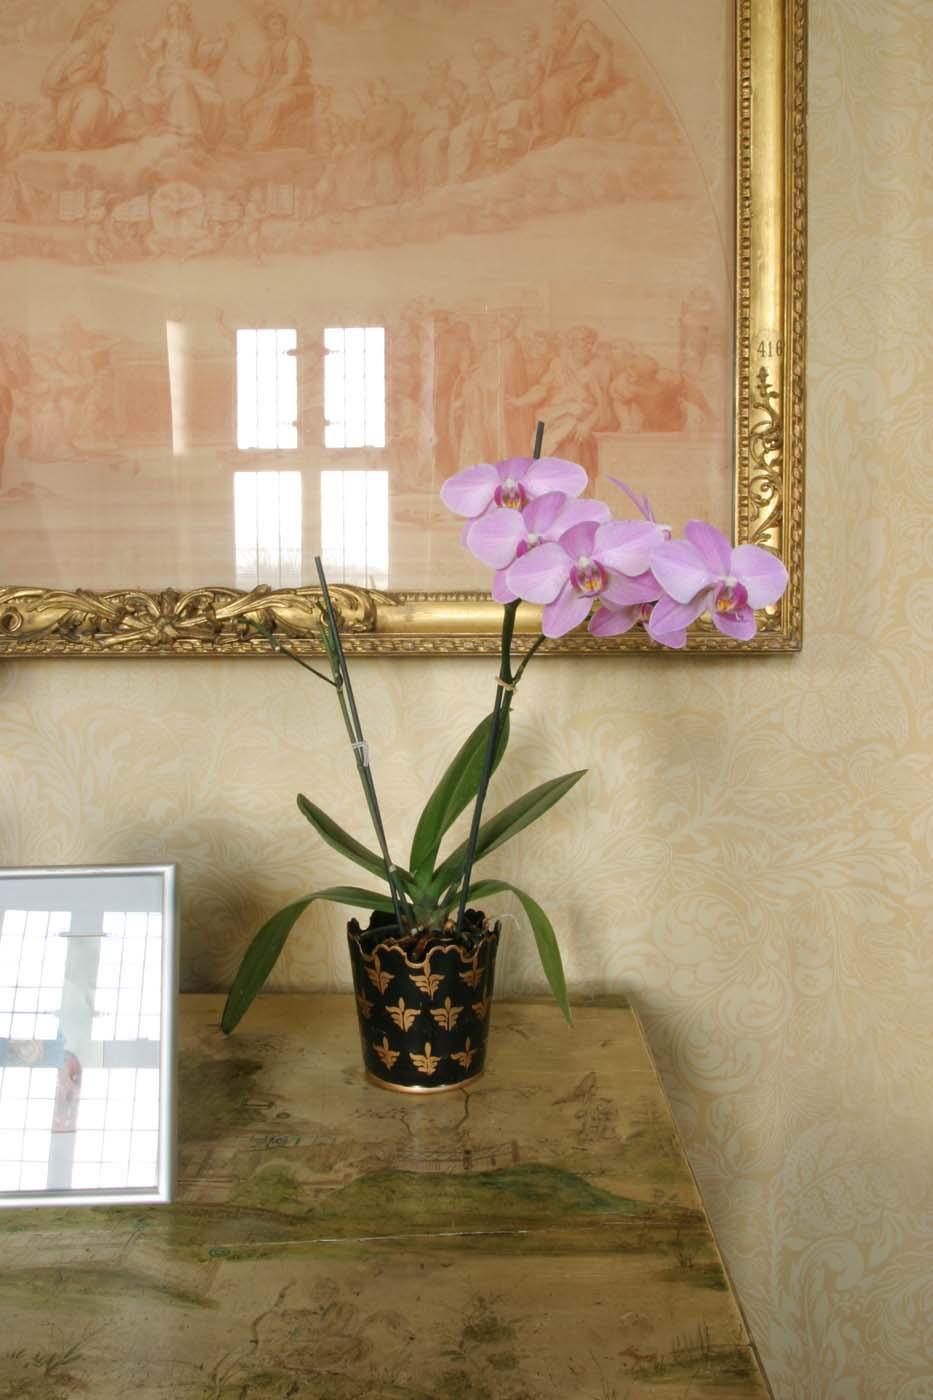 Carol_Fulton_Photography_interiors_Chilham_Castle__001.jpg